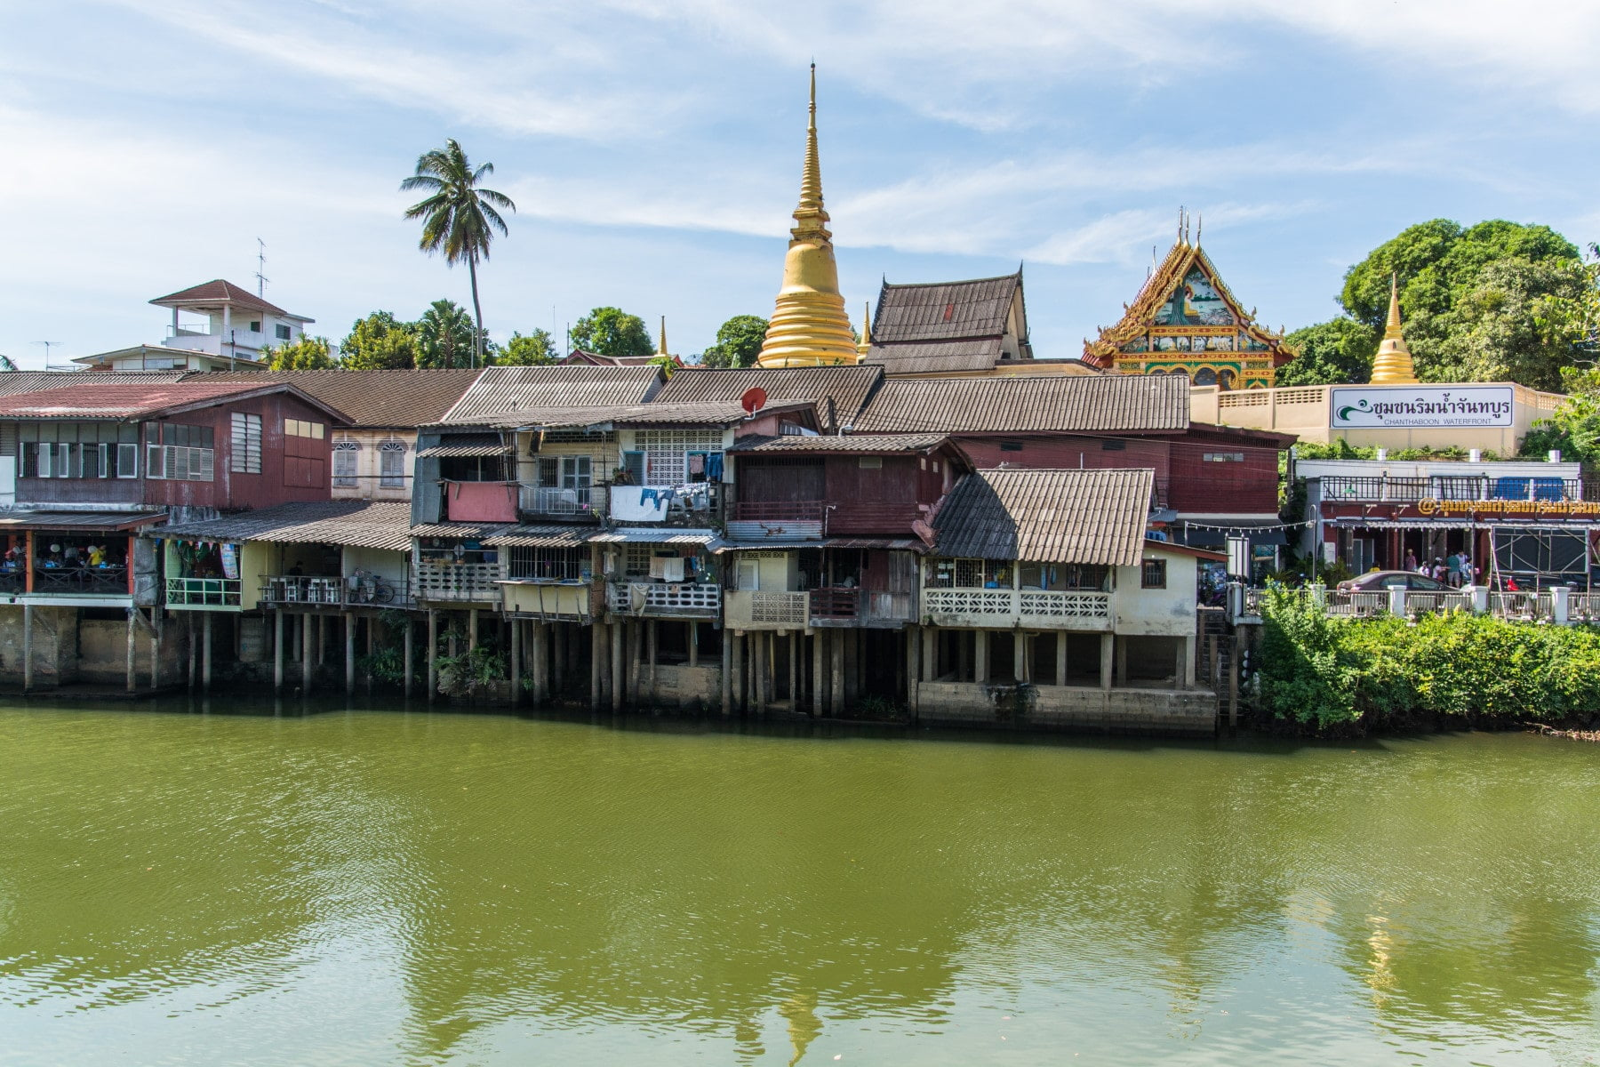 vue wat bot muang riviere chanthaburi - thailande